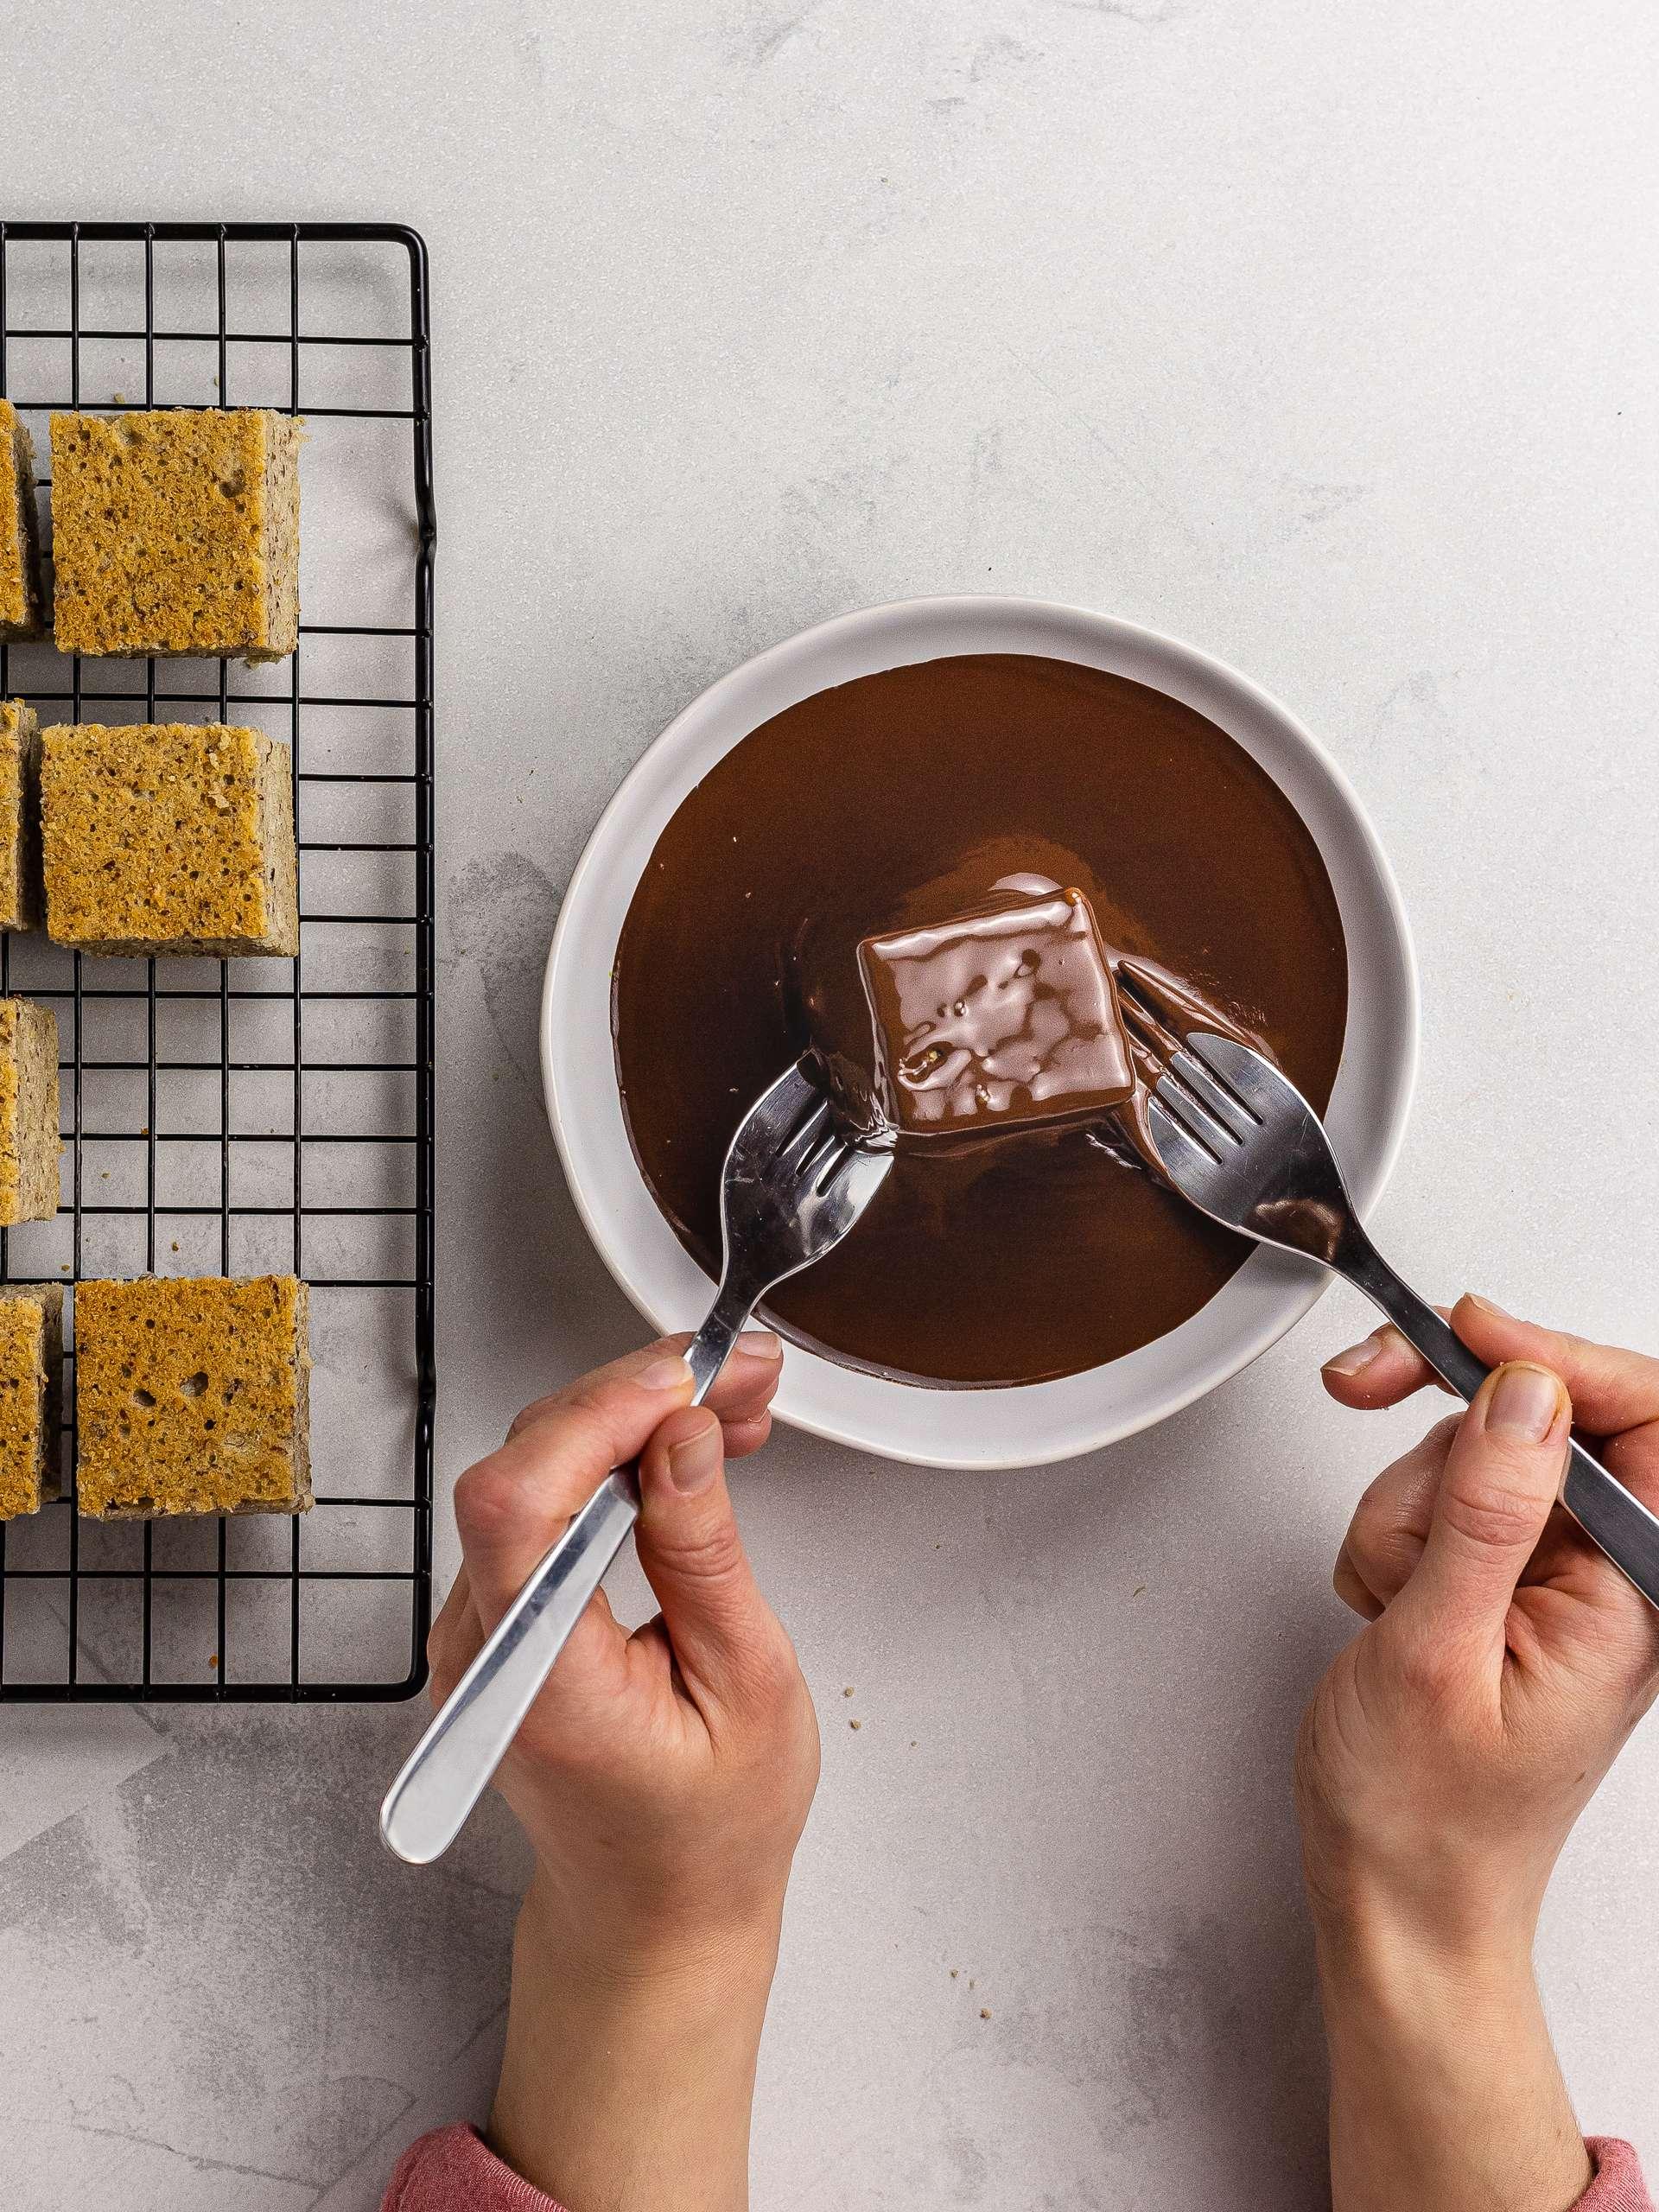 lamington squares coated with dark chocolate